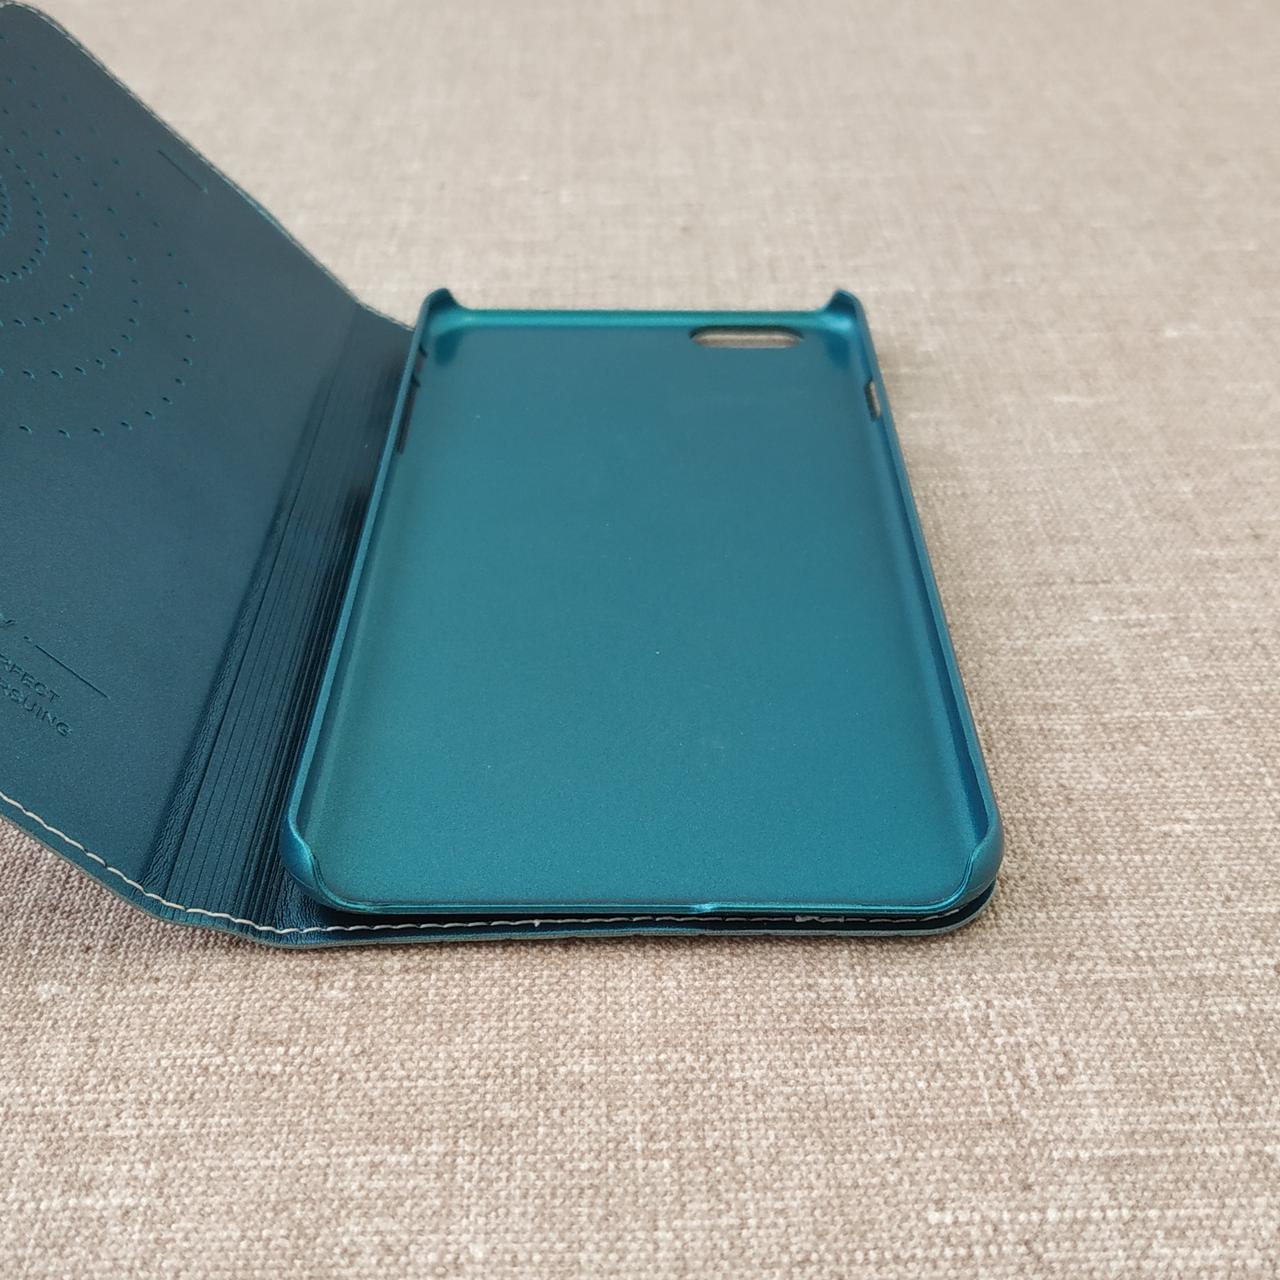 Nillkin Ice iPhone 6 Plus turquoise Для телефона